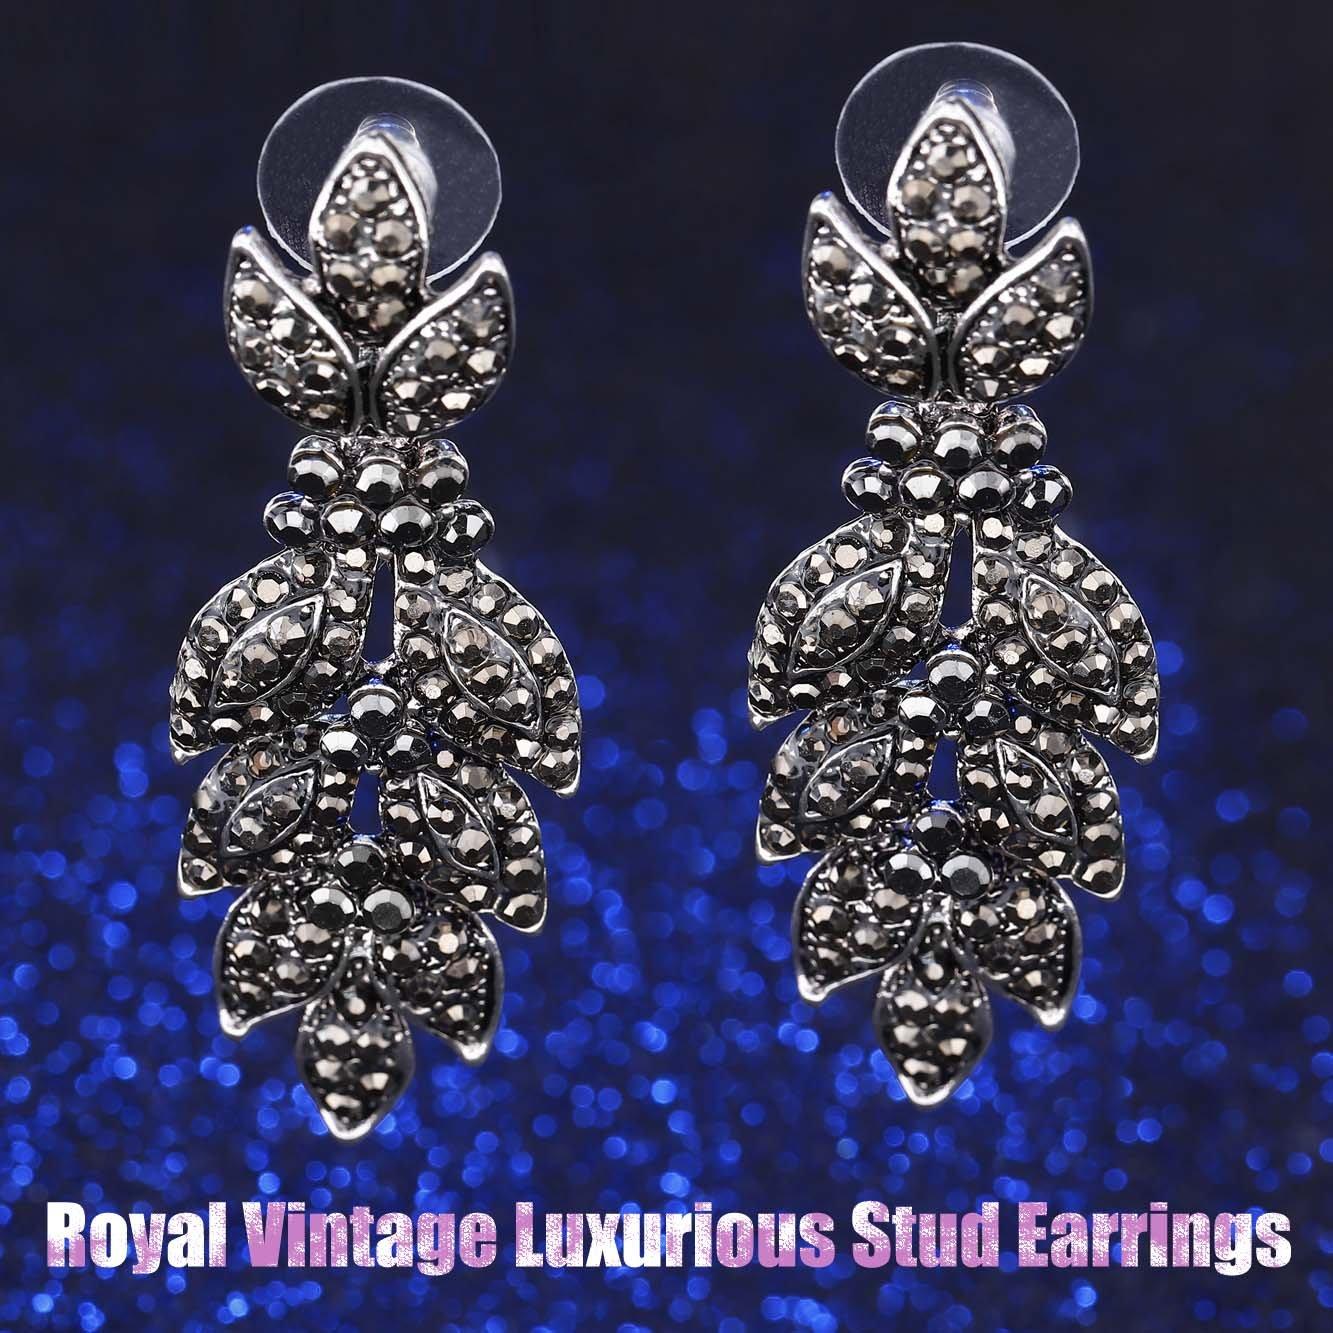 Unicra Vintage Black Crystal Stud Earrings Wedding Bridal Multiple Rhinestone Earrings Chandelier Long Dangle Earrings for Women and Girls by Unicra (Image #5)